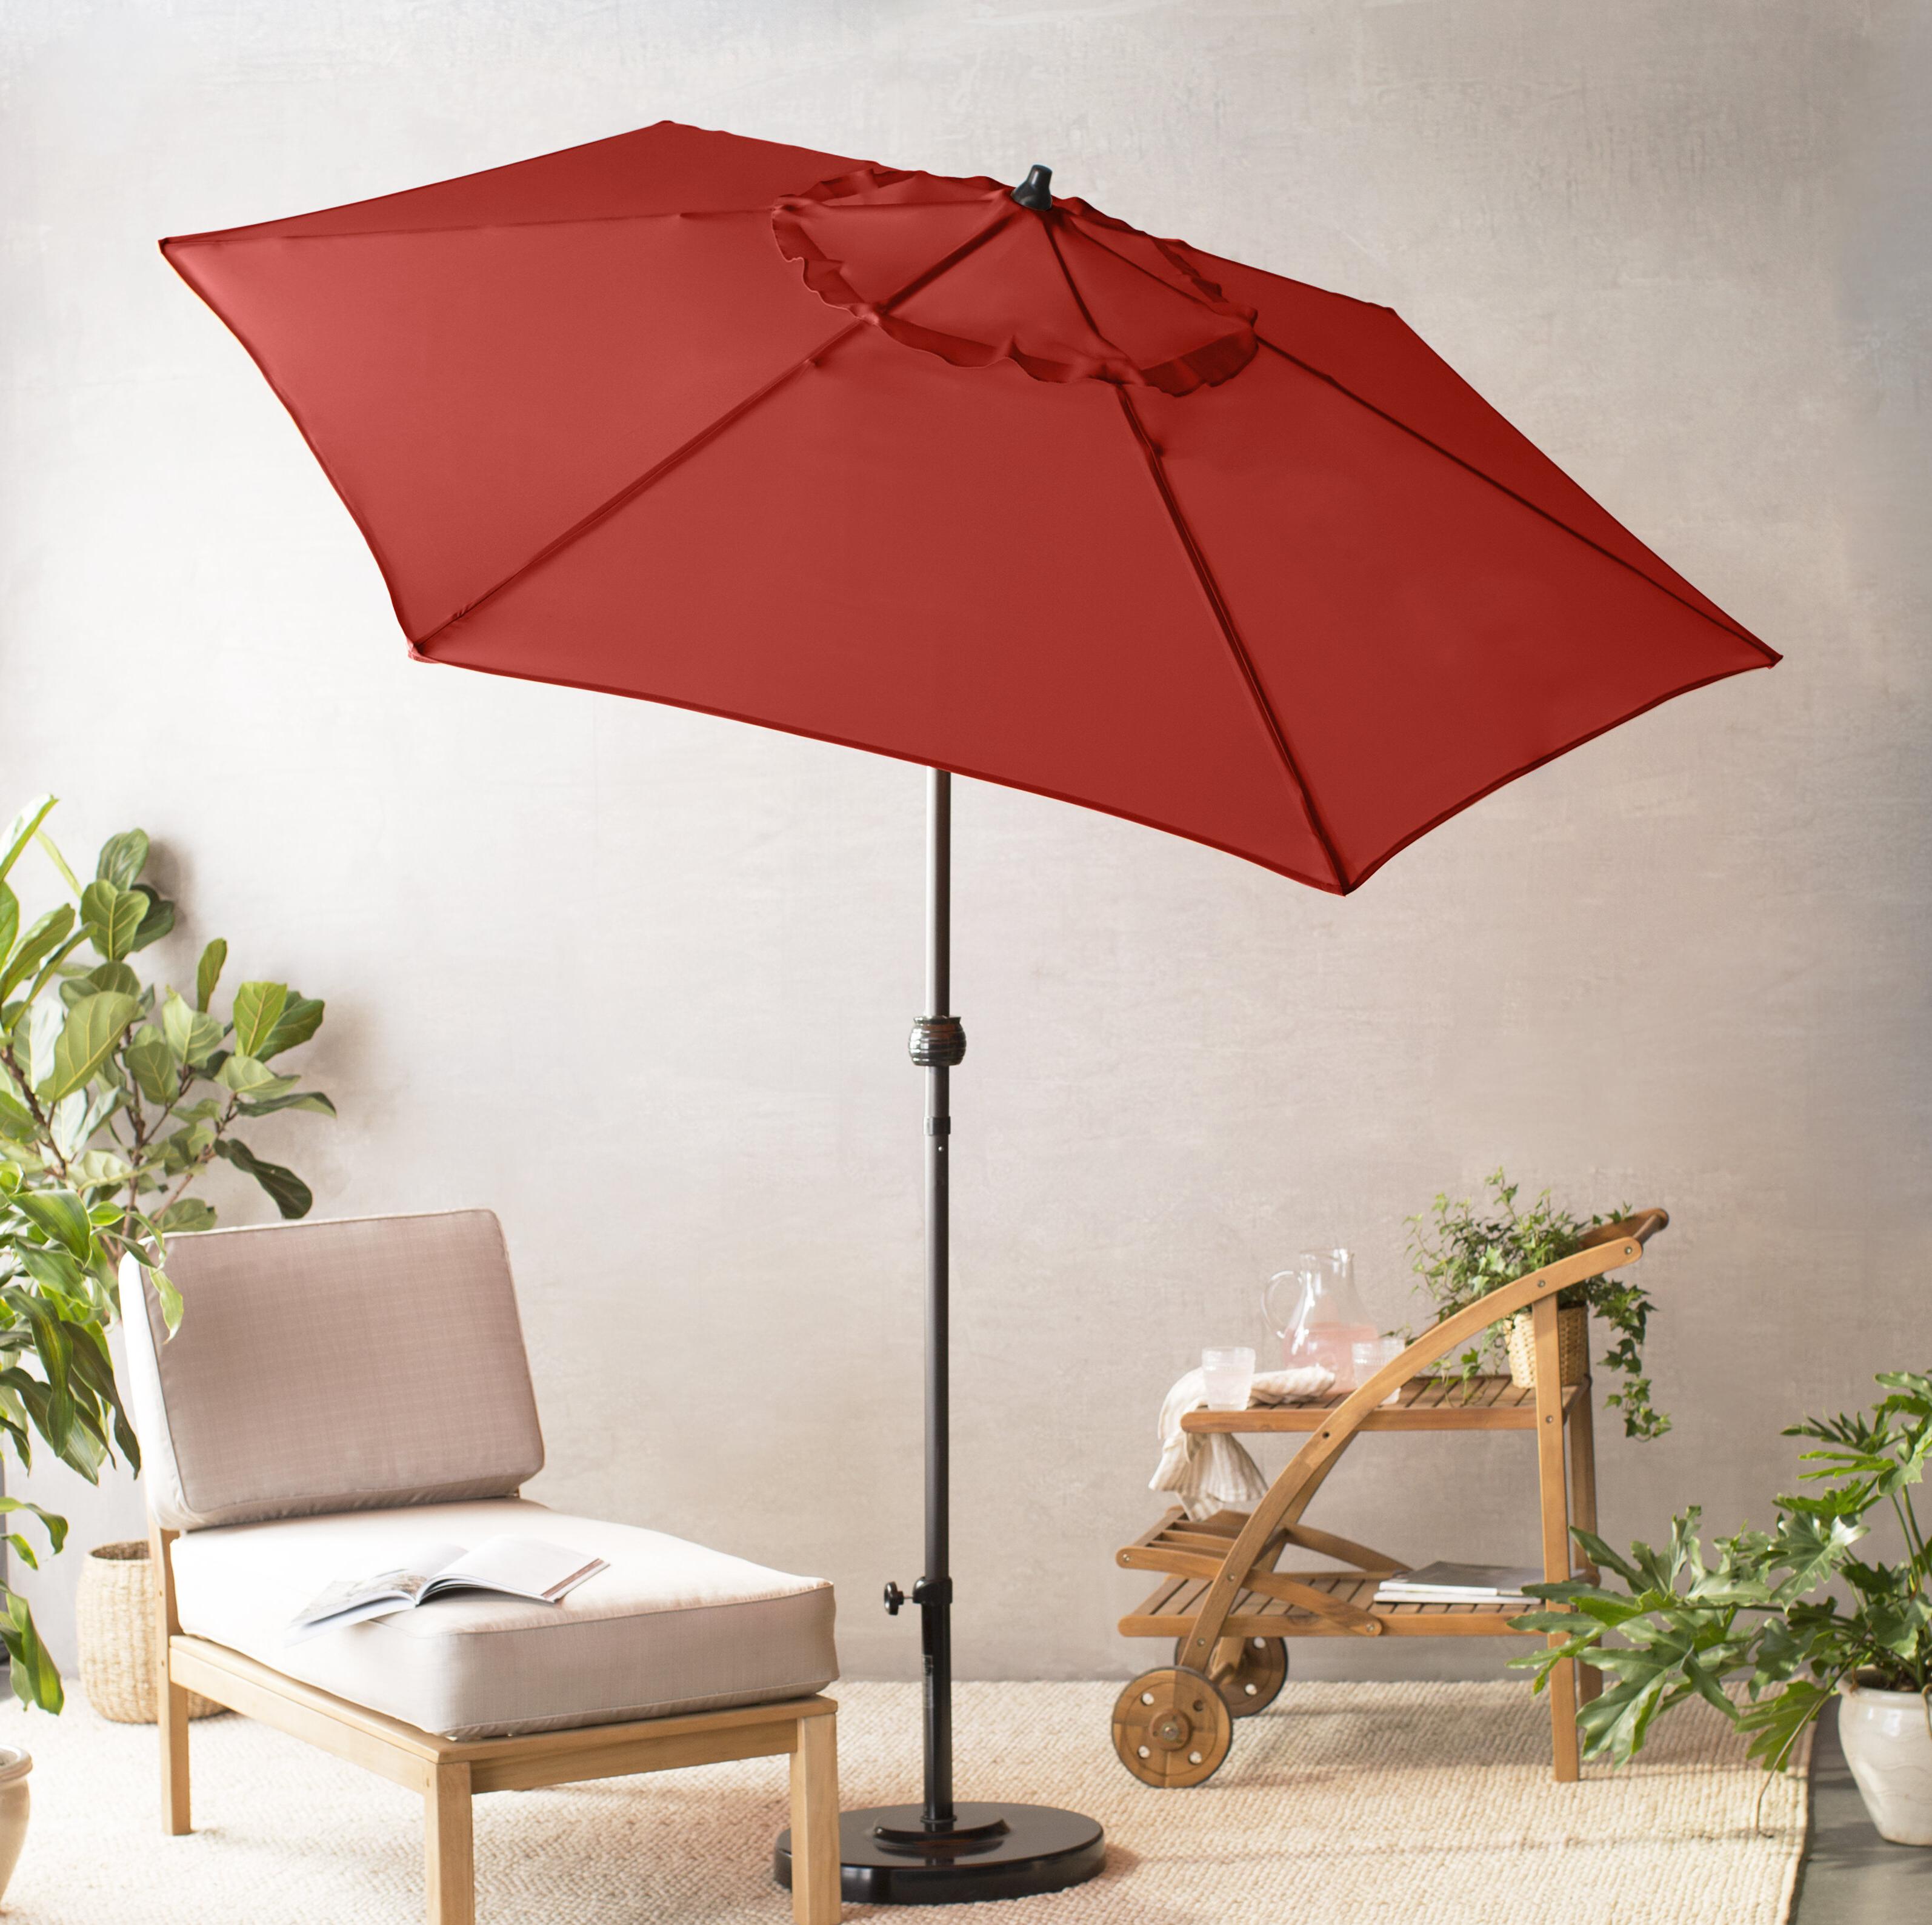 Kearney 9' Market Umbrella Regarding Most Recent Kelton Market Umbrellas (Gallery 9 of 20)